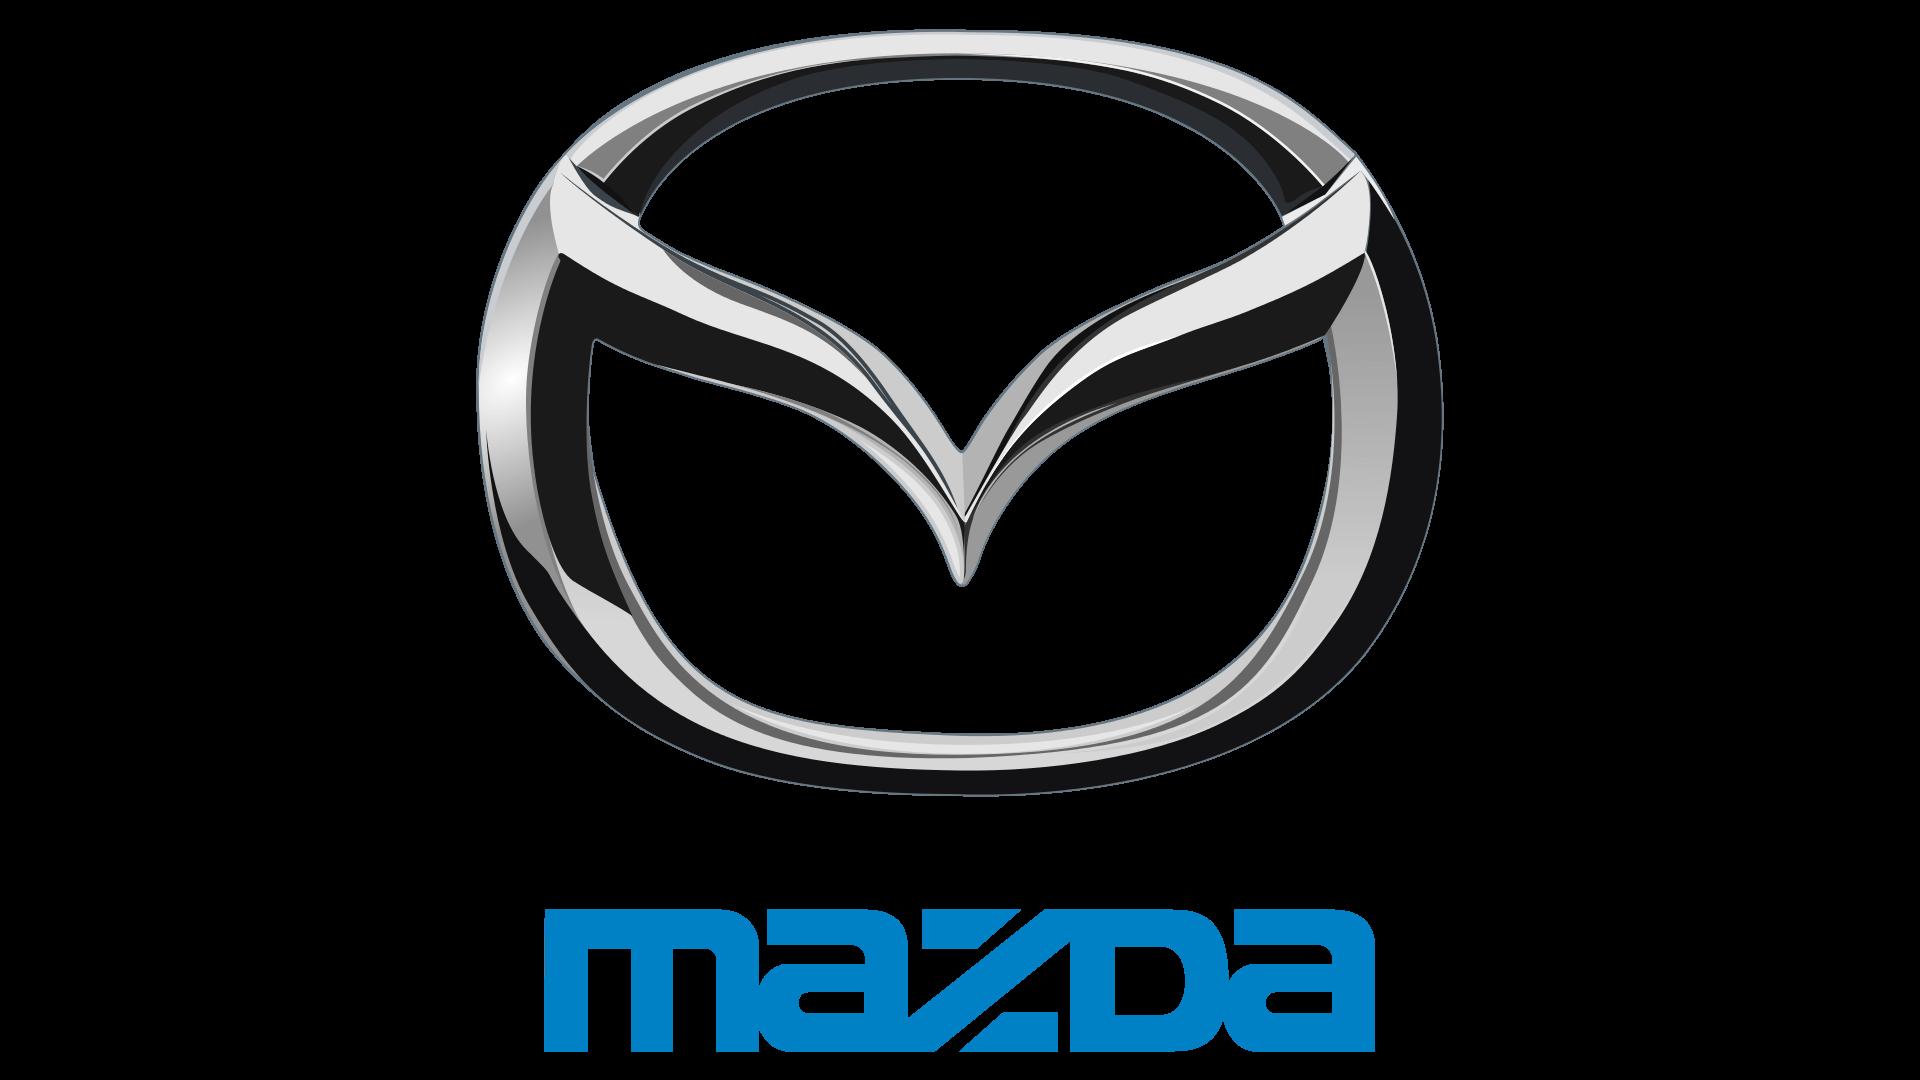 Car Logo Mazda transparent PNG.